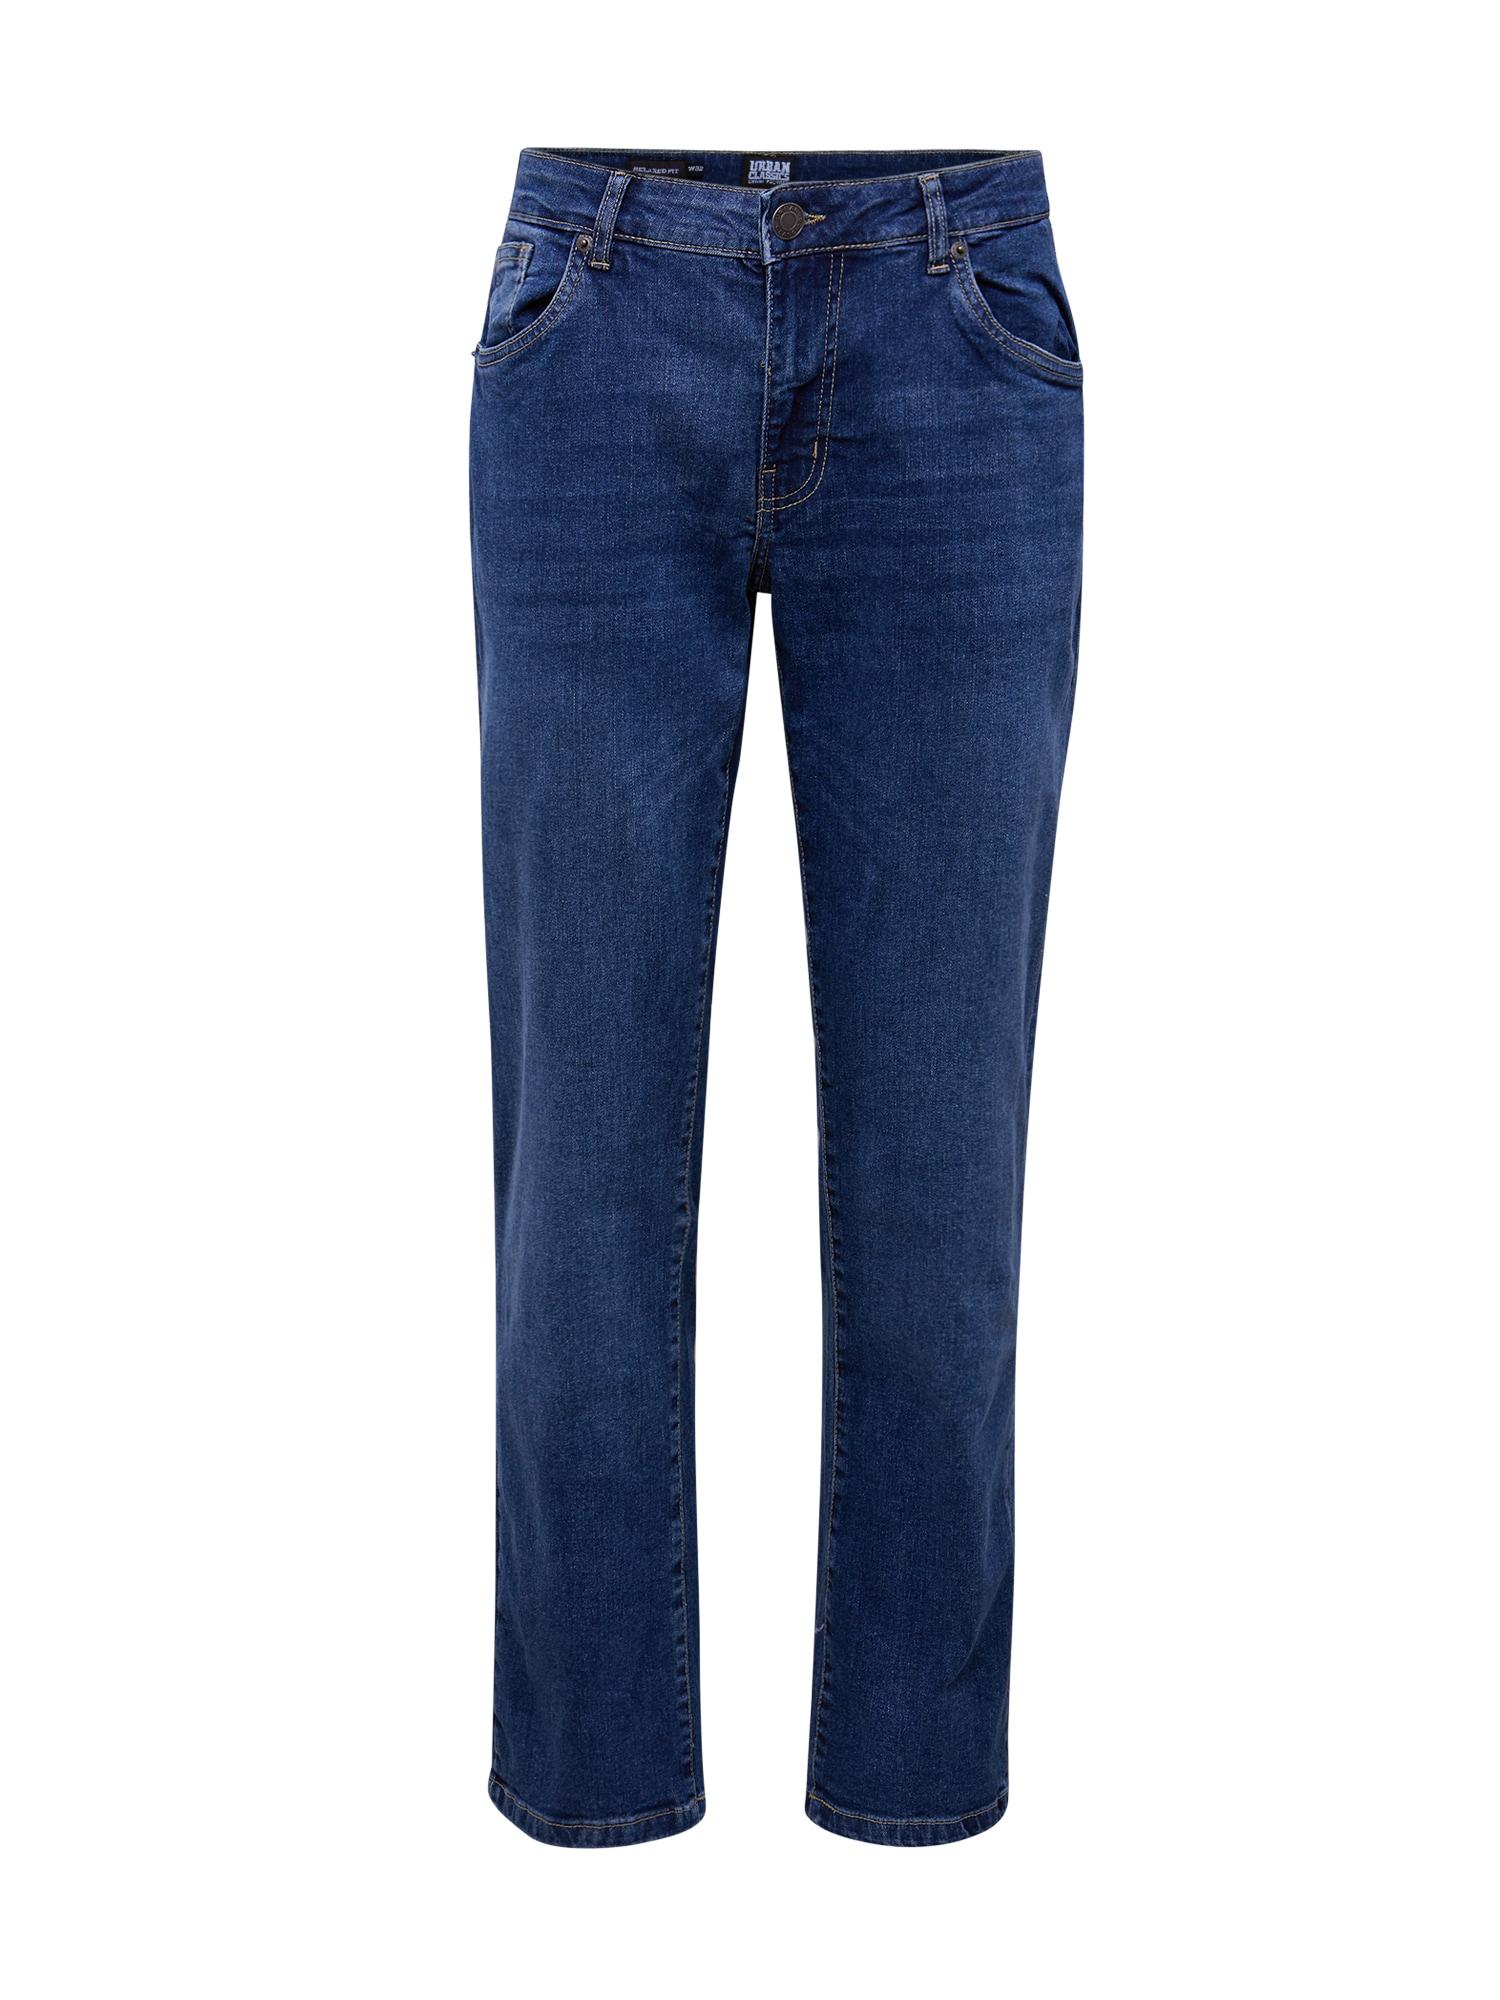 Urban Classics Jeans 'Relaxed Fit Jeans'  denim albastru